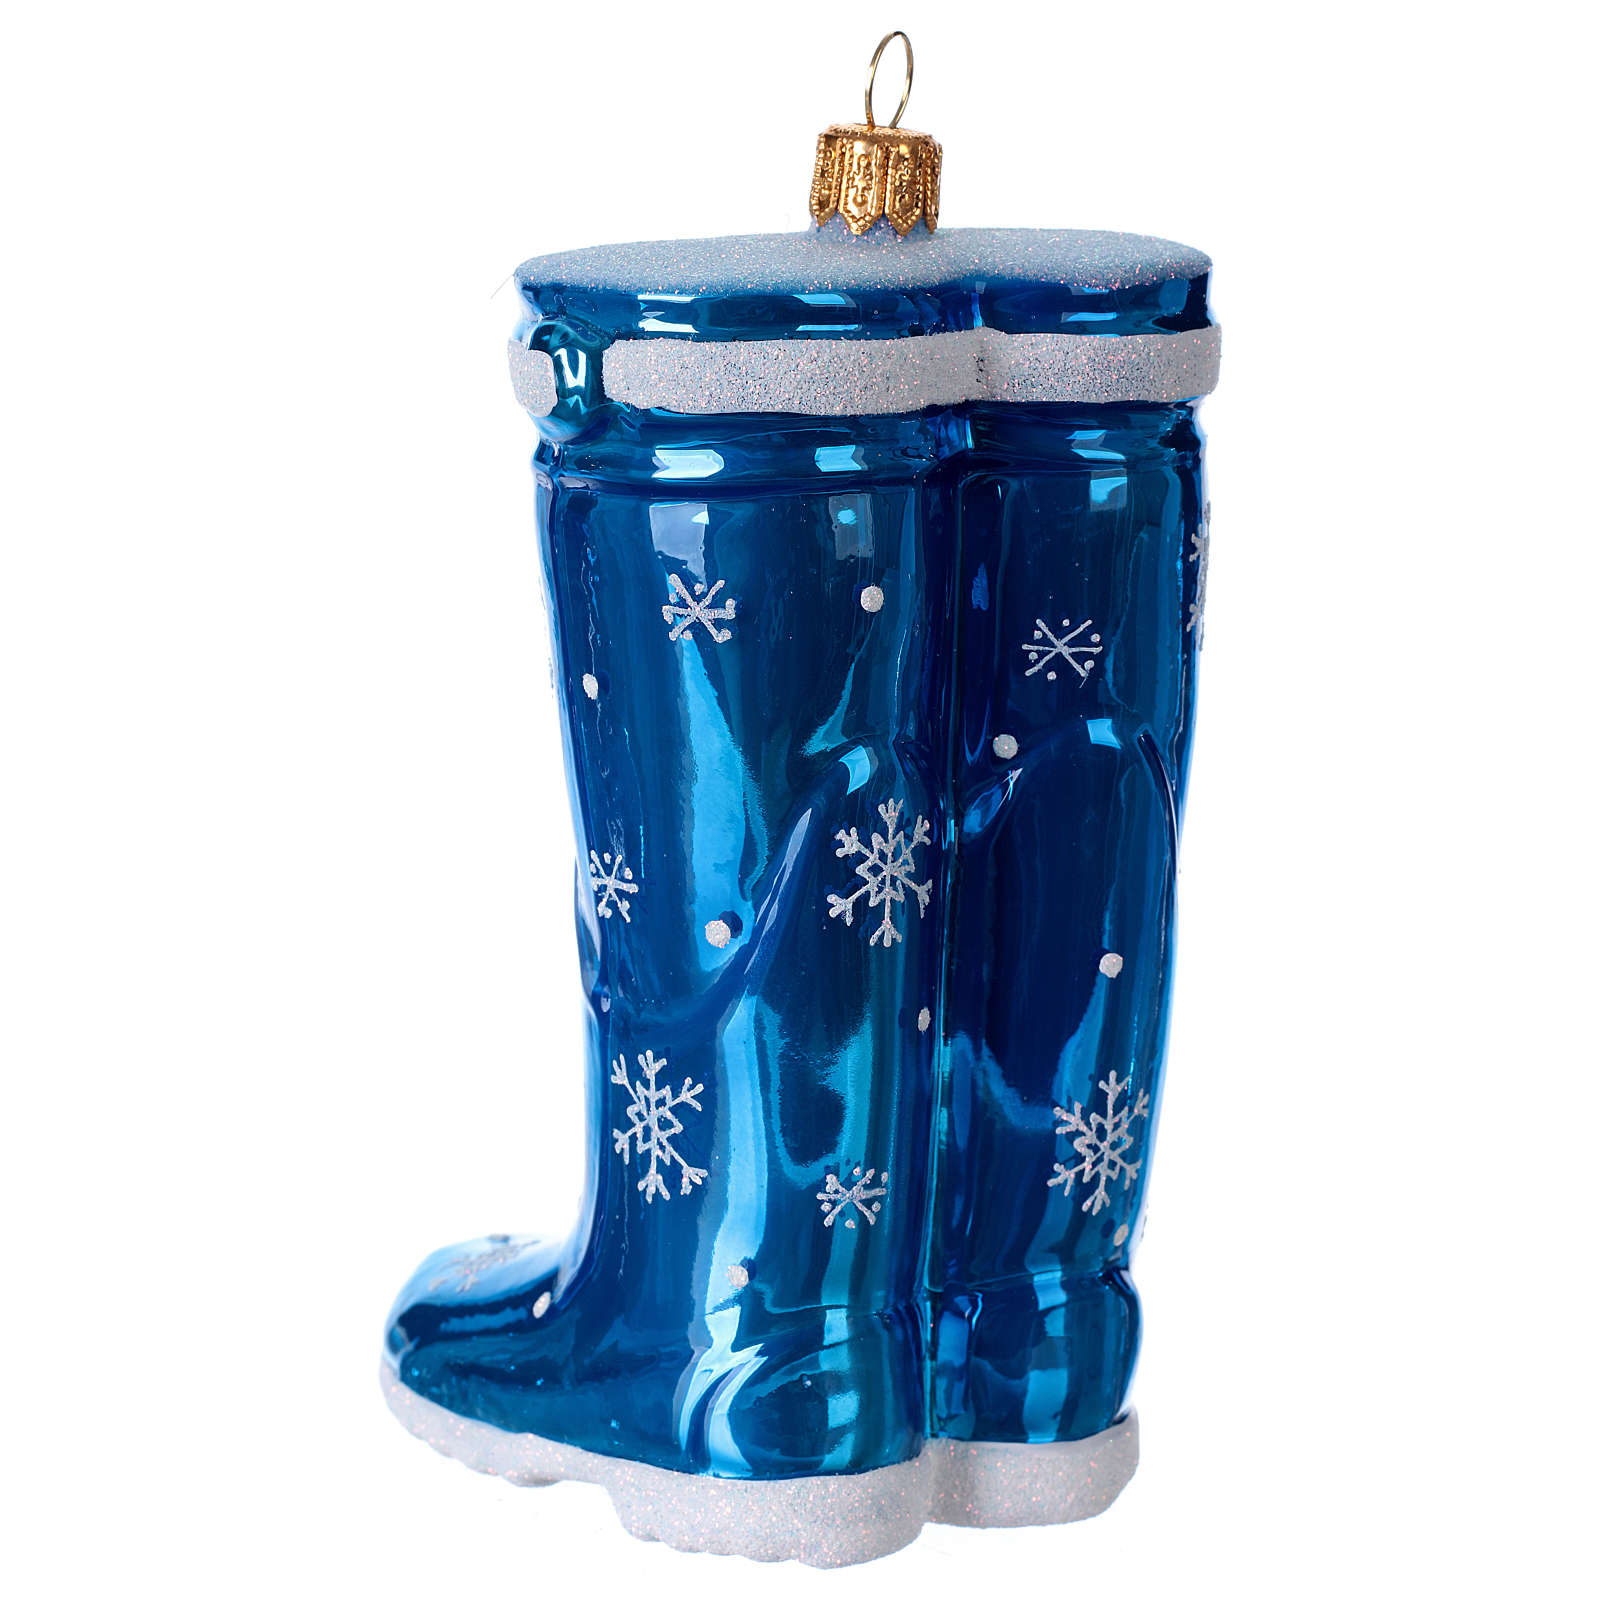 Blown glass Christmas ornament, blue rubber boots 4